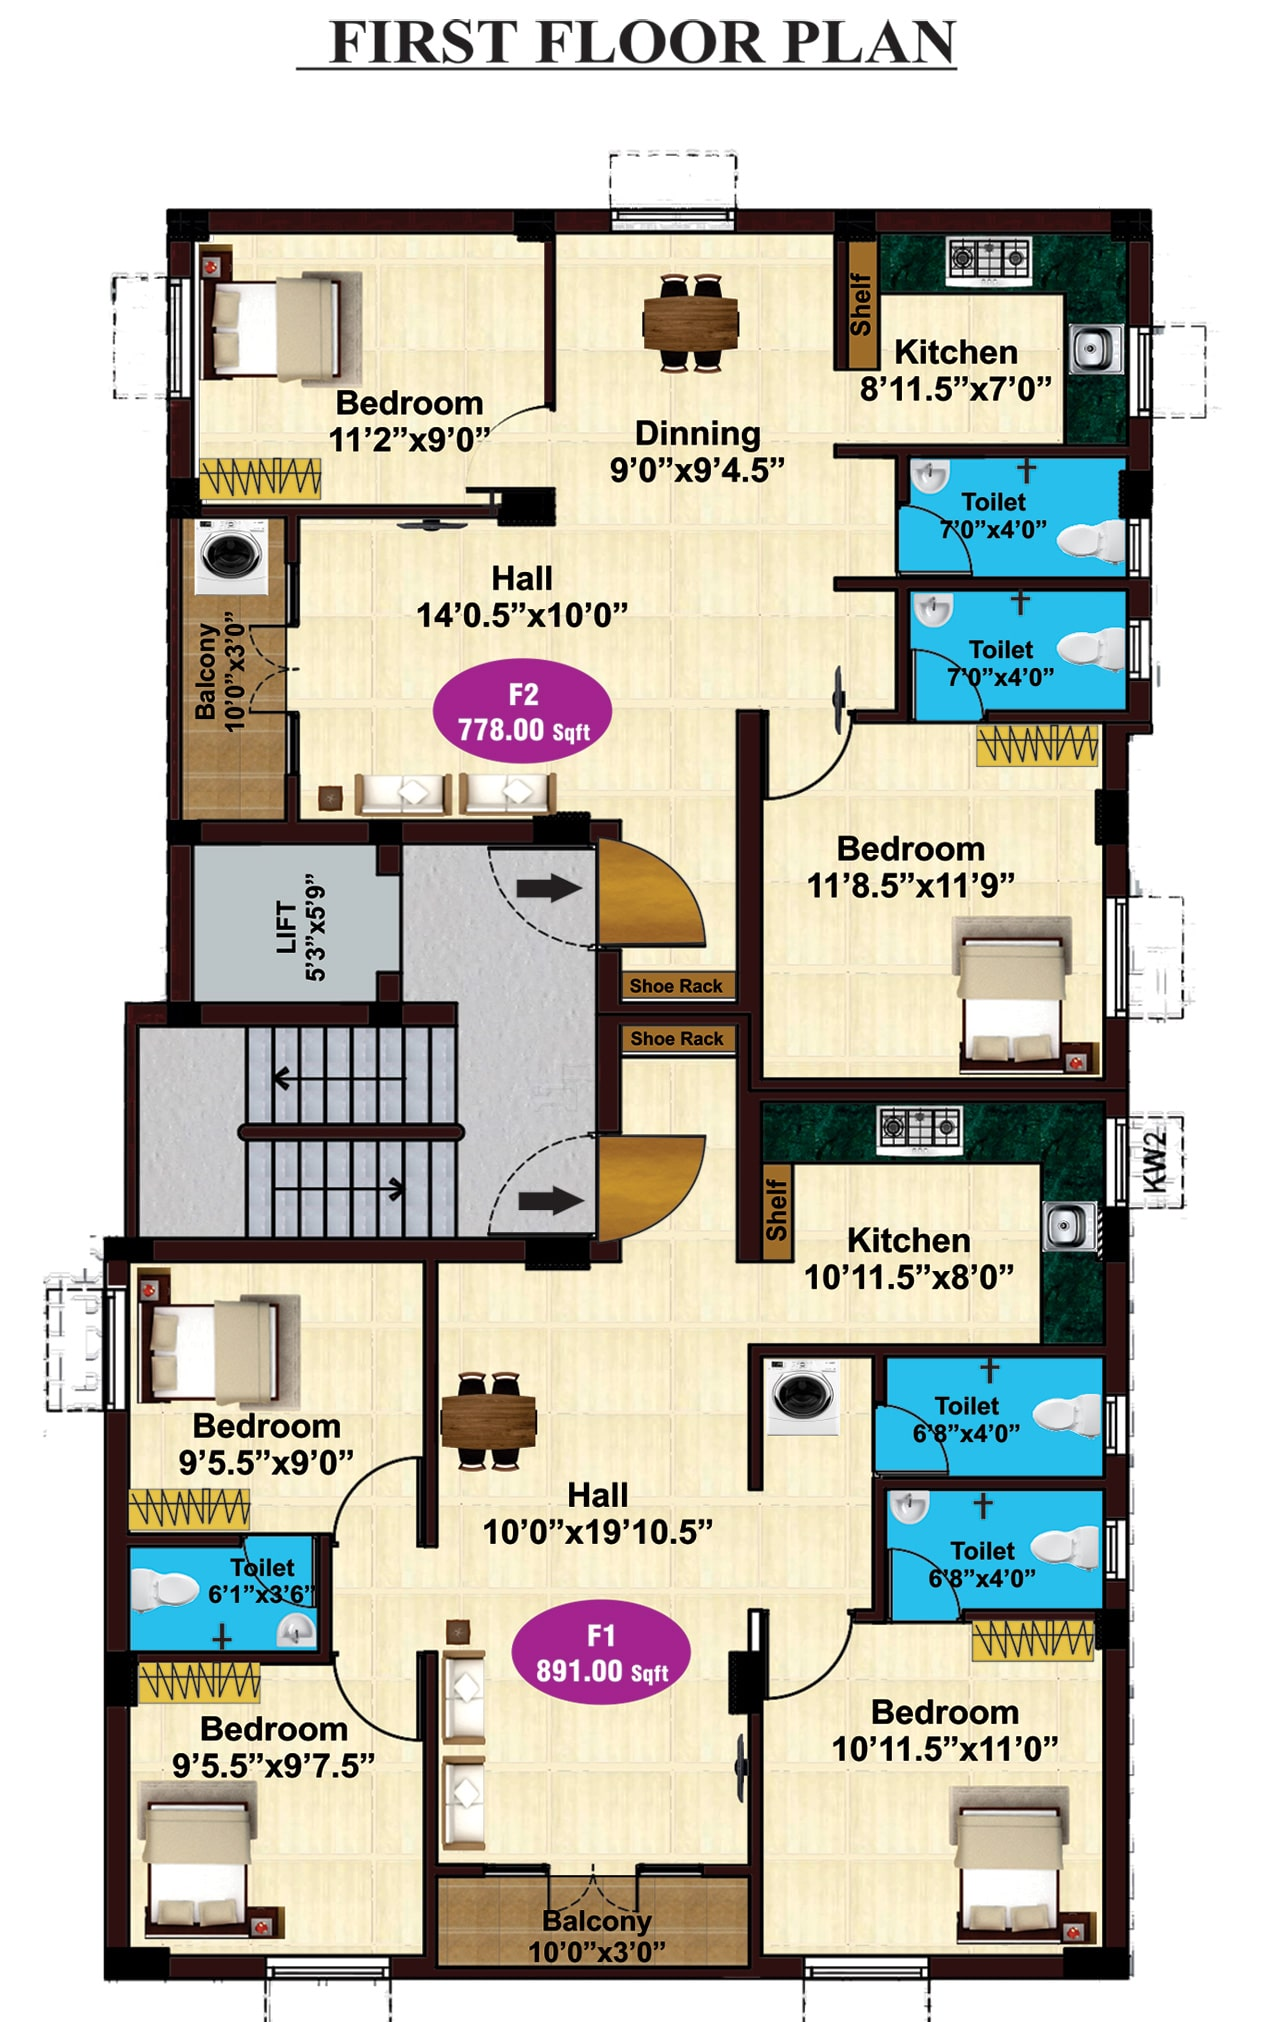 jkb-siddharth-enclave-first-floor-plan